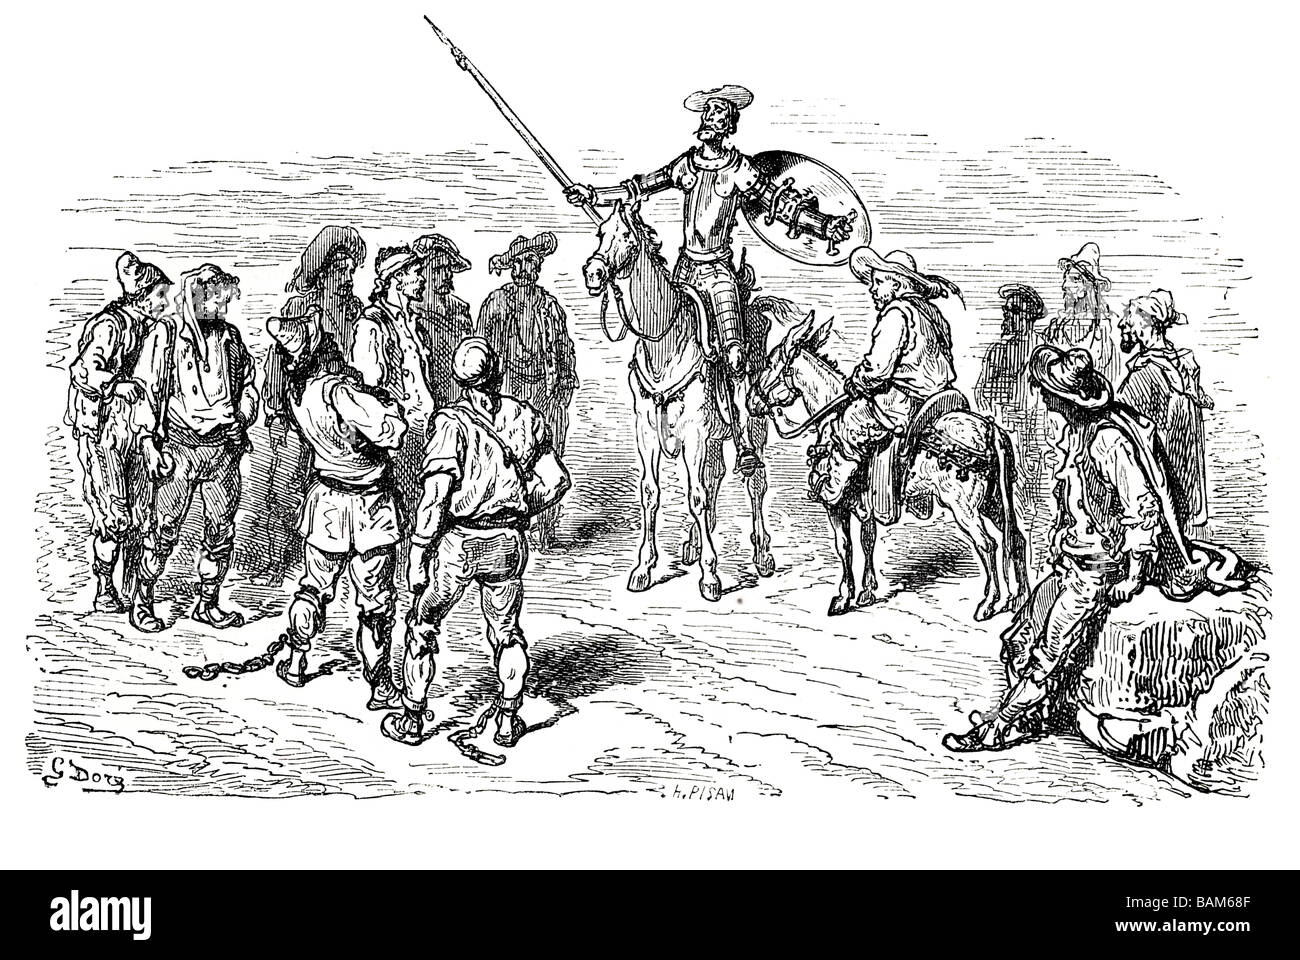 chapter XXL Don quixote spanish novel Alonso Quixano Cervantes literature quest Stock Photo